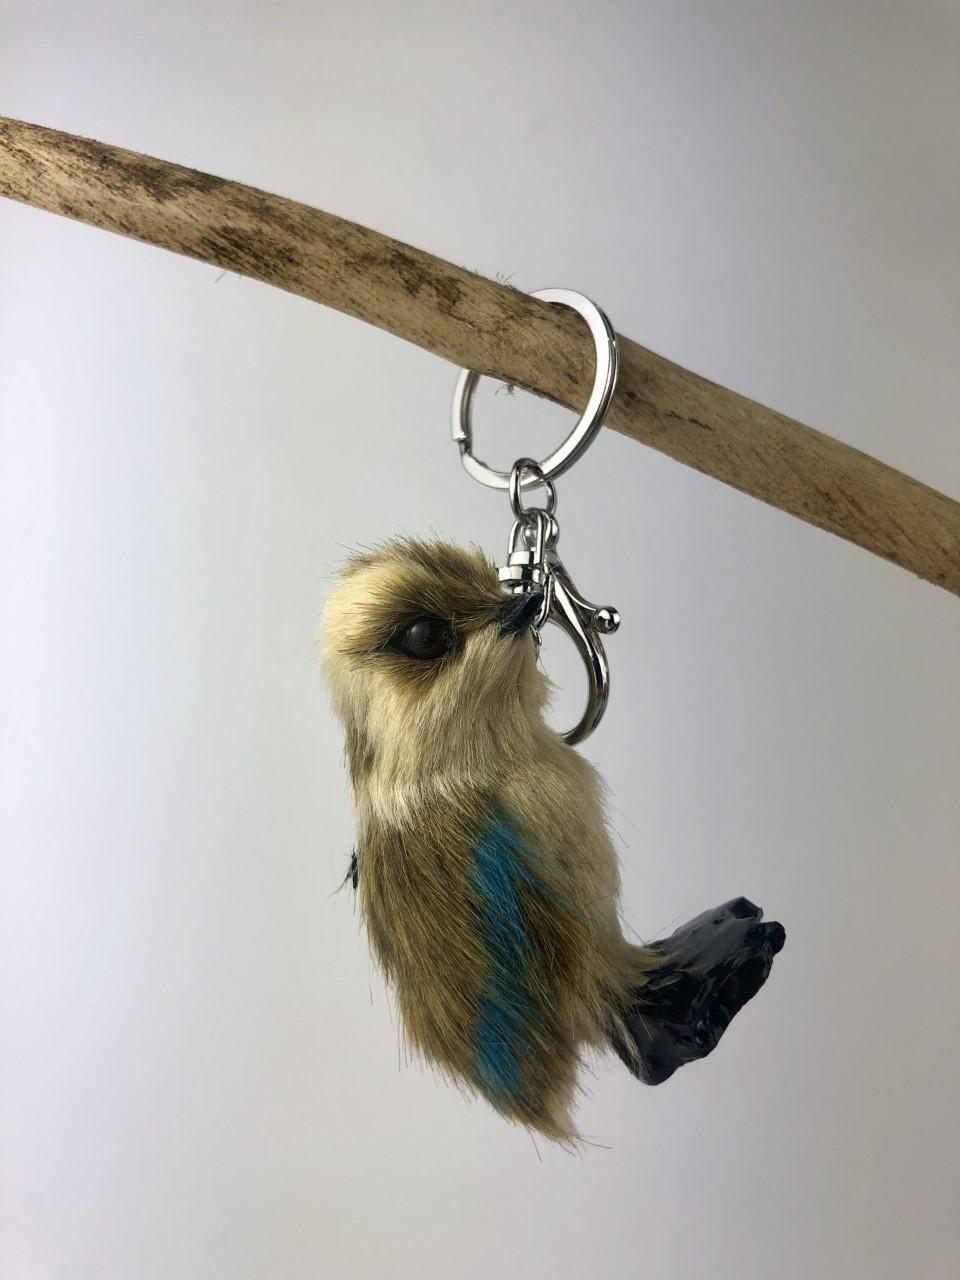 Gorgeous Furry Friends Keyring KOOKABURRA. Collect them all